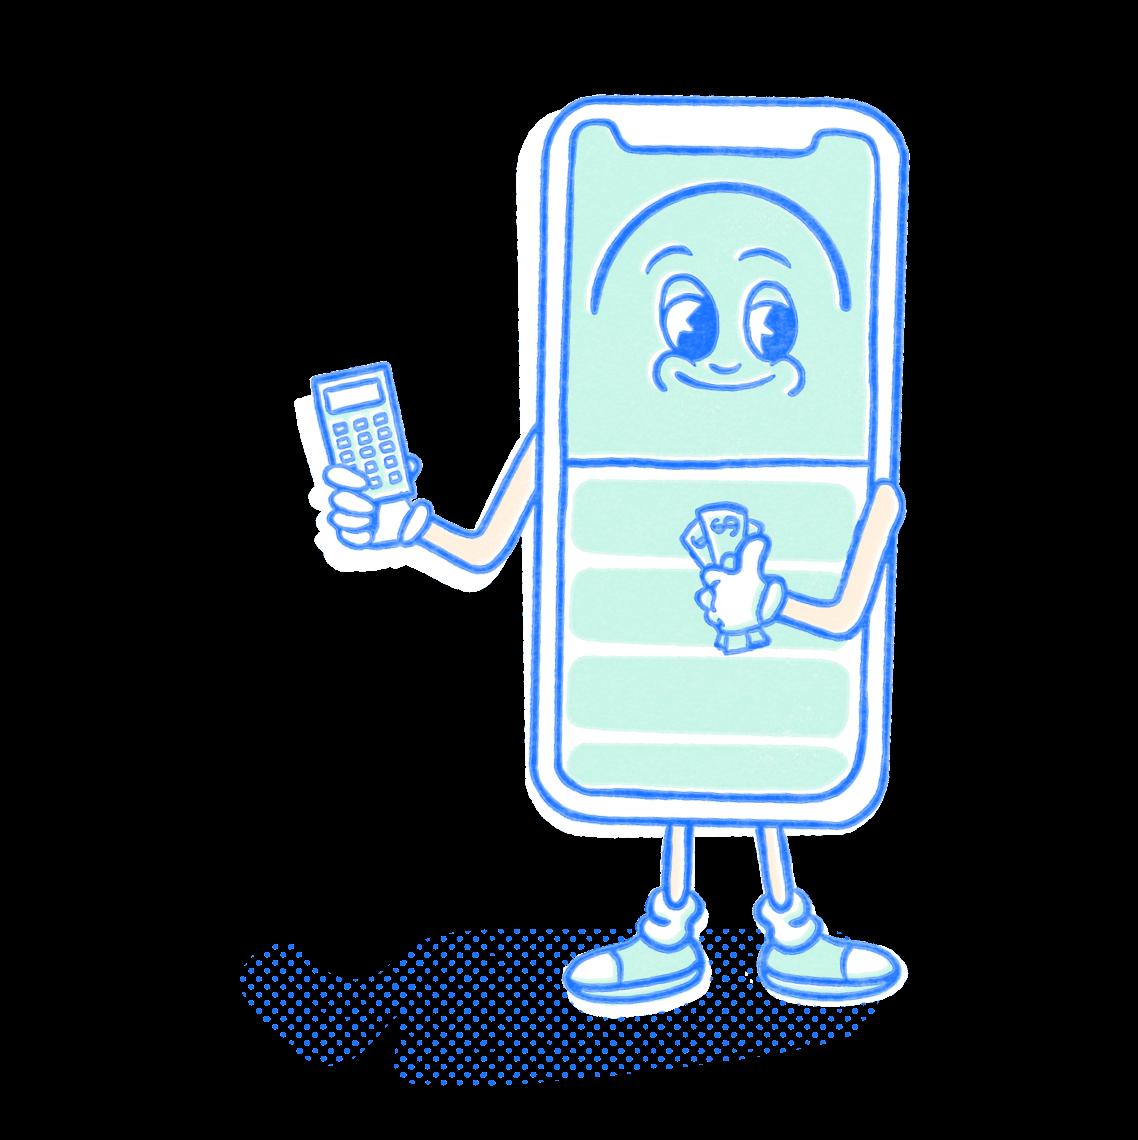 Finance Pocket Prep mascot holding a calculator and dollar bills. Illustration.